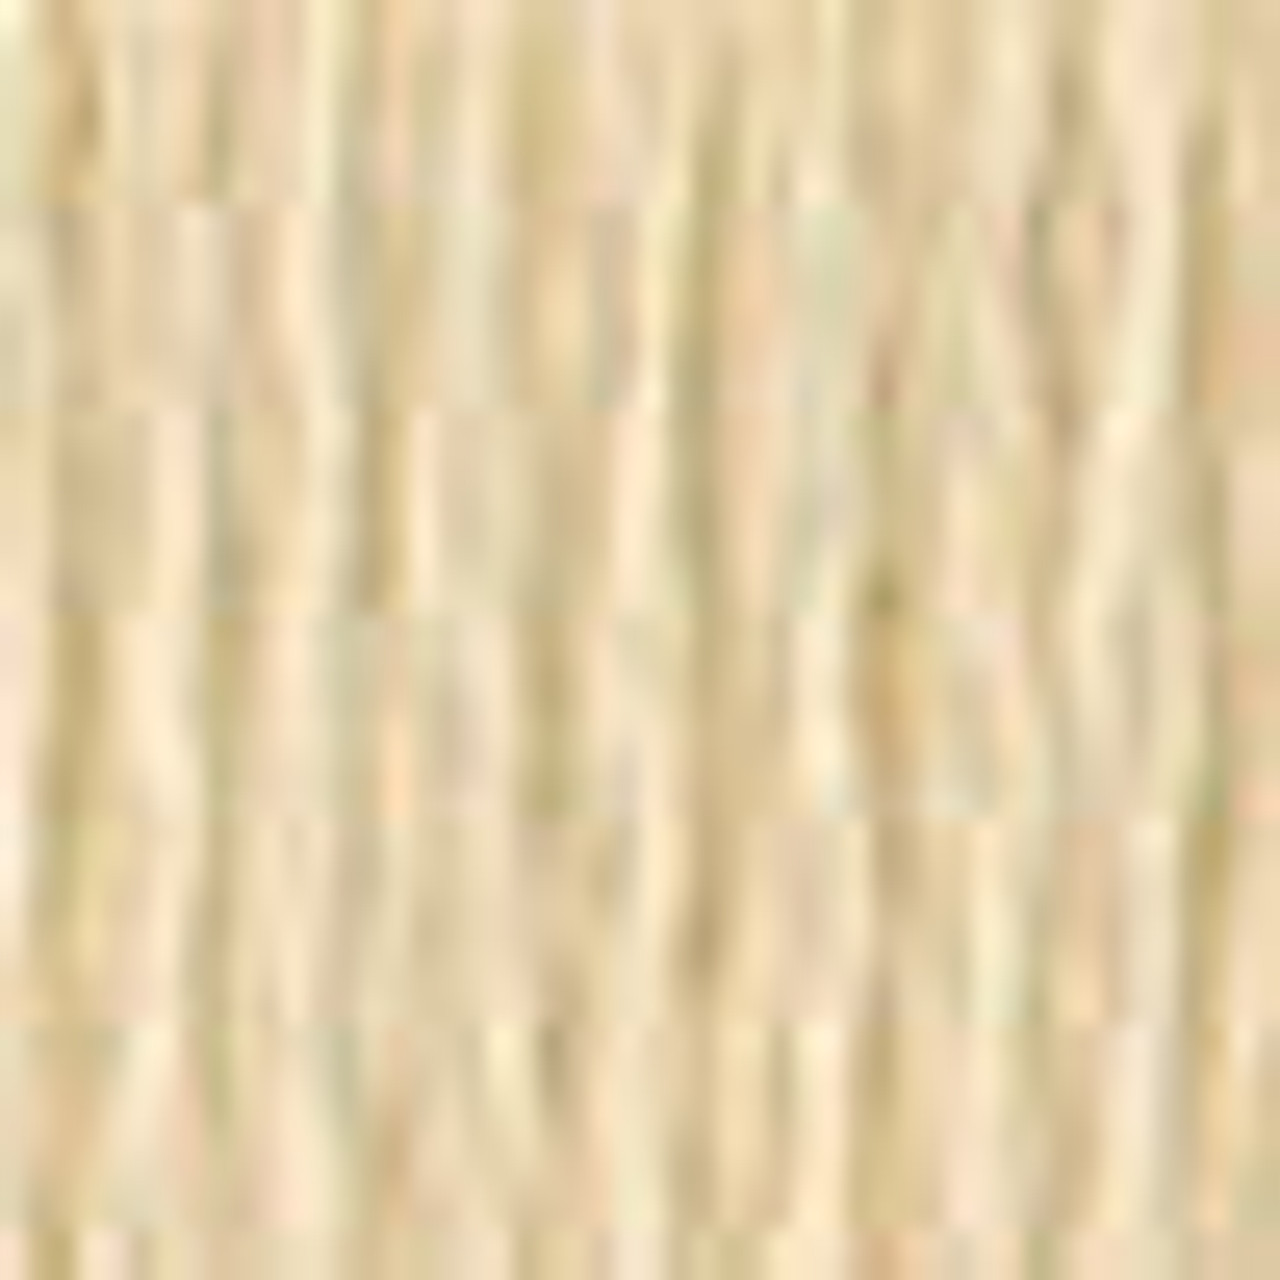 DMC # 677 Very Light Old Gold Floss / Thread